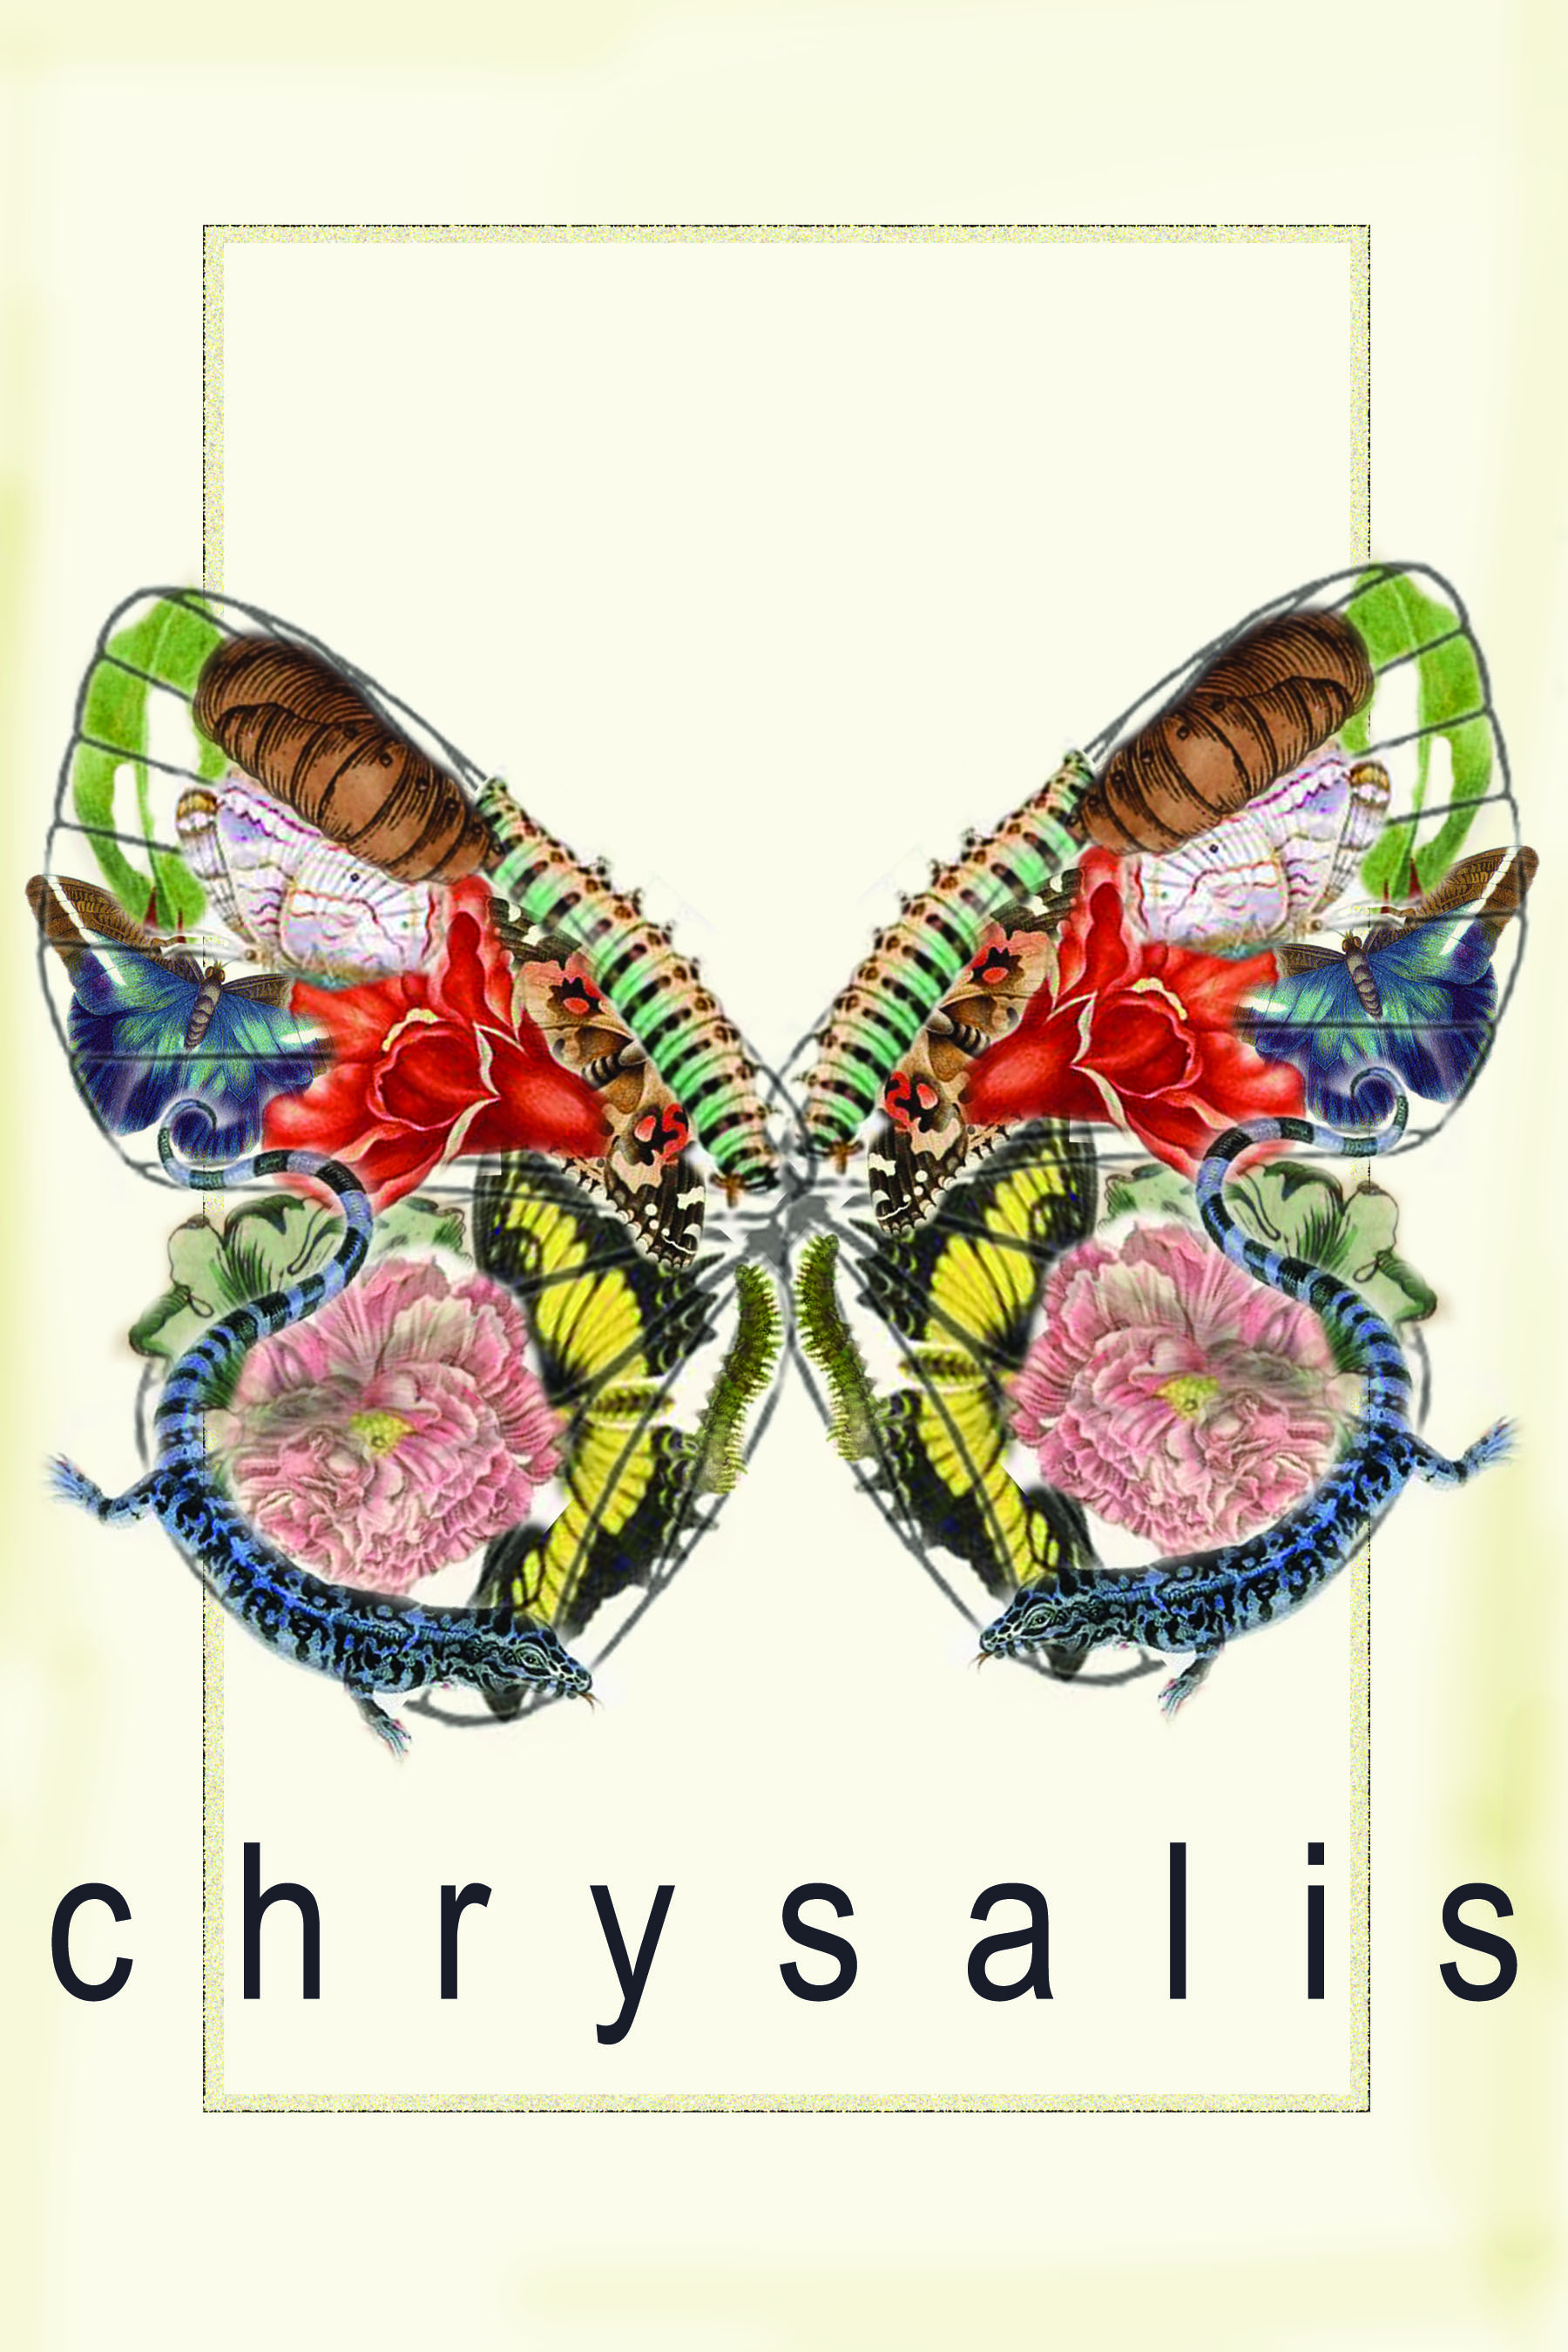 chrysalisFINAL